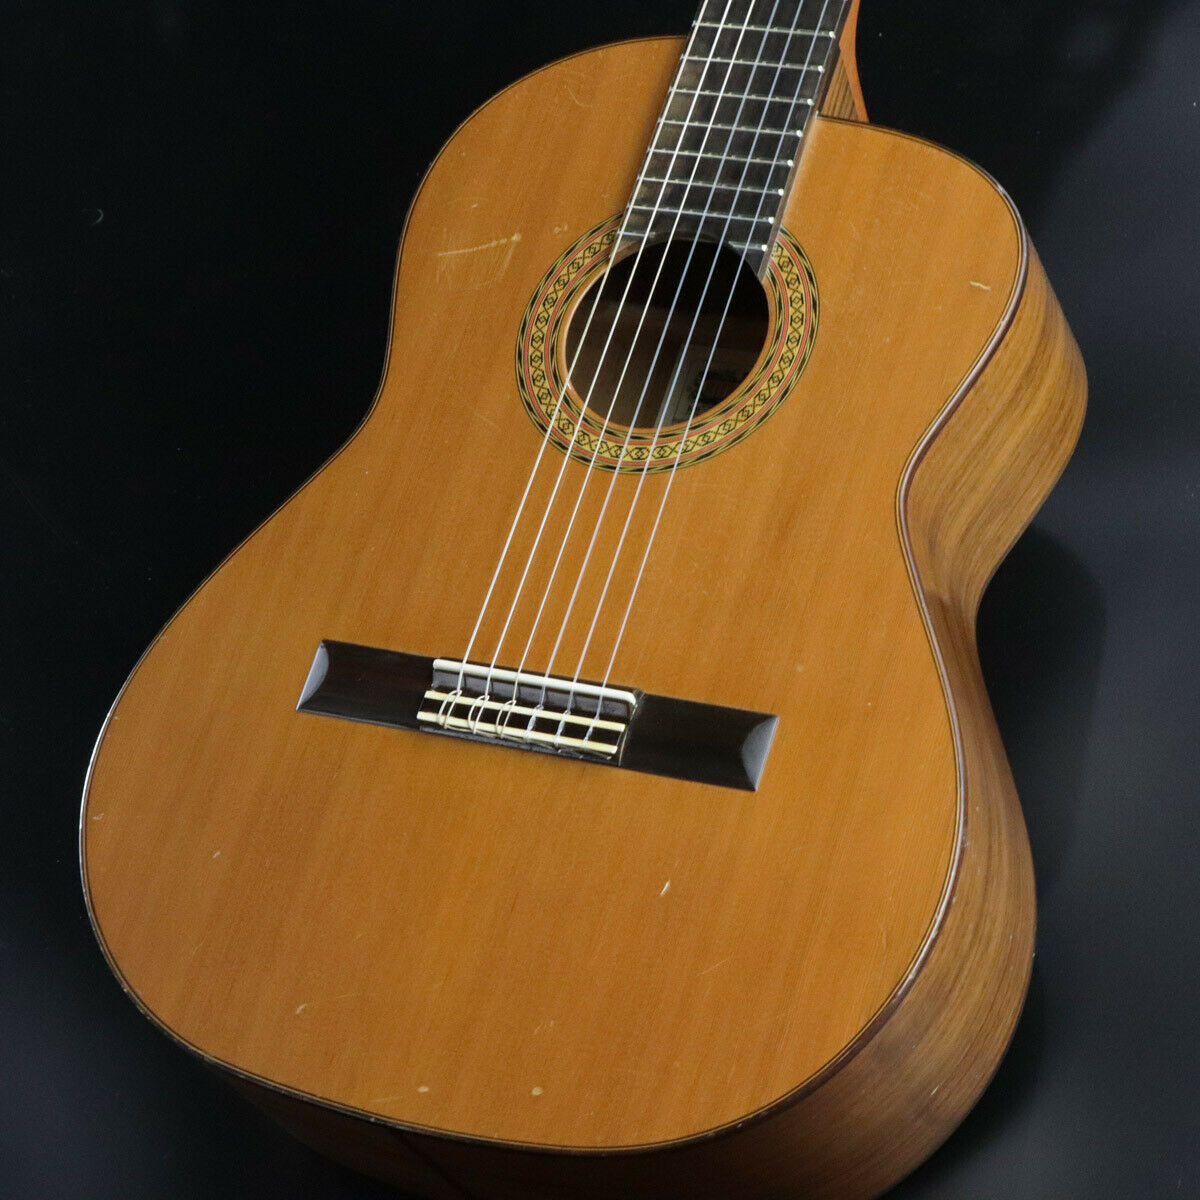 NIIBORI Alto Guitar acoustic guitar Japan rare beautiful vintage popular EMS F S